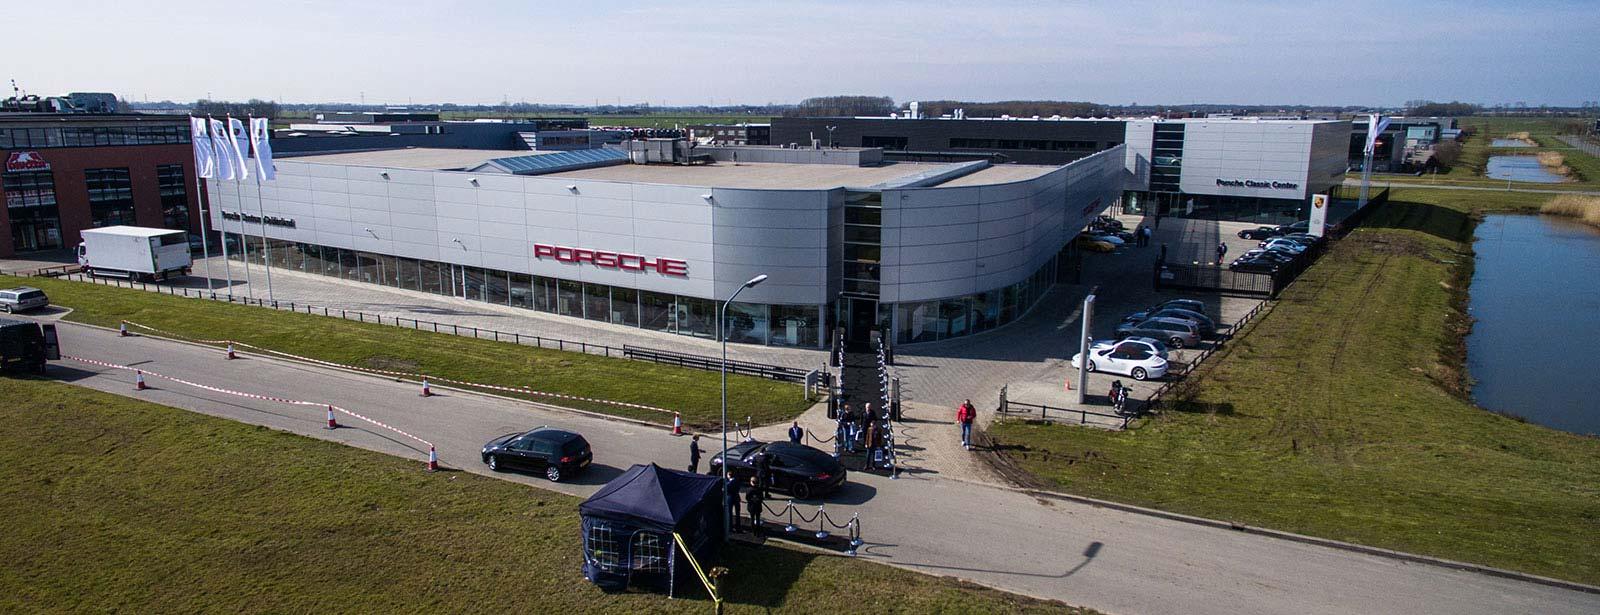 10 jaar Porsche Centrum Gelderland